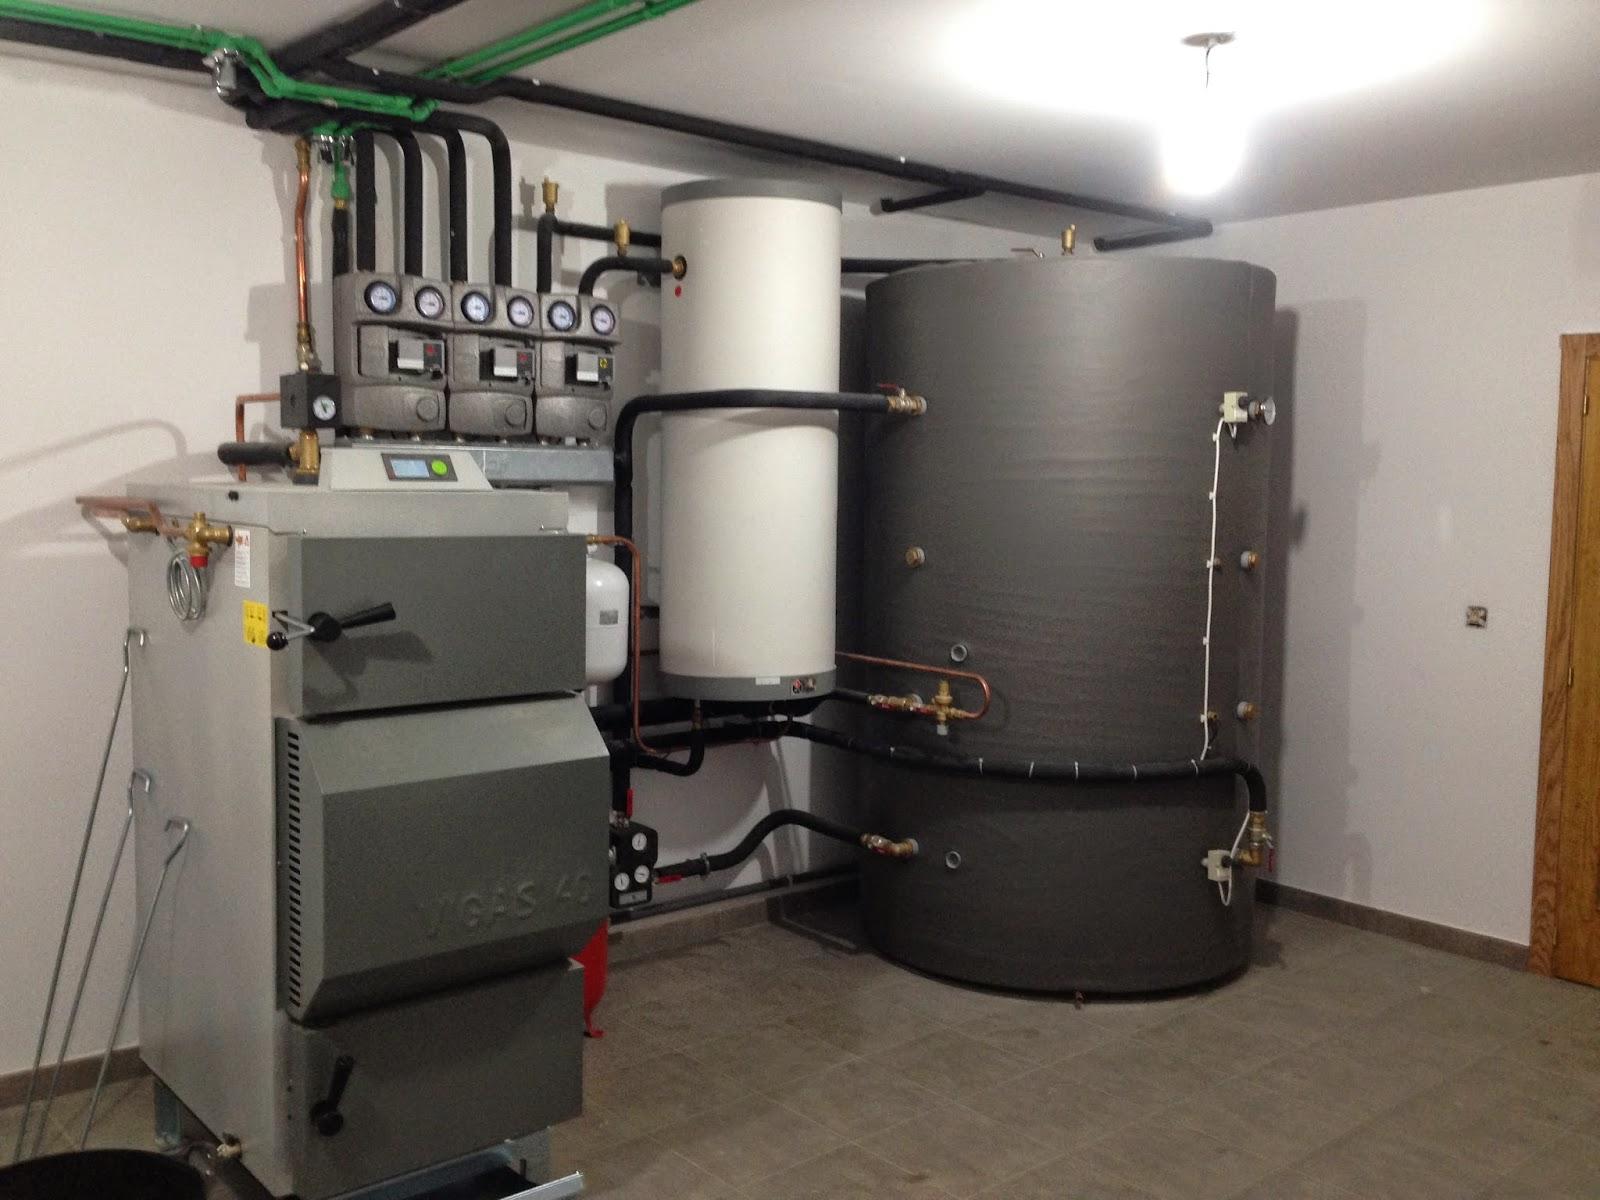 Instalaci n de caldera de le a en castropol asturias for Calderas para calefaccion central a lena